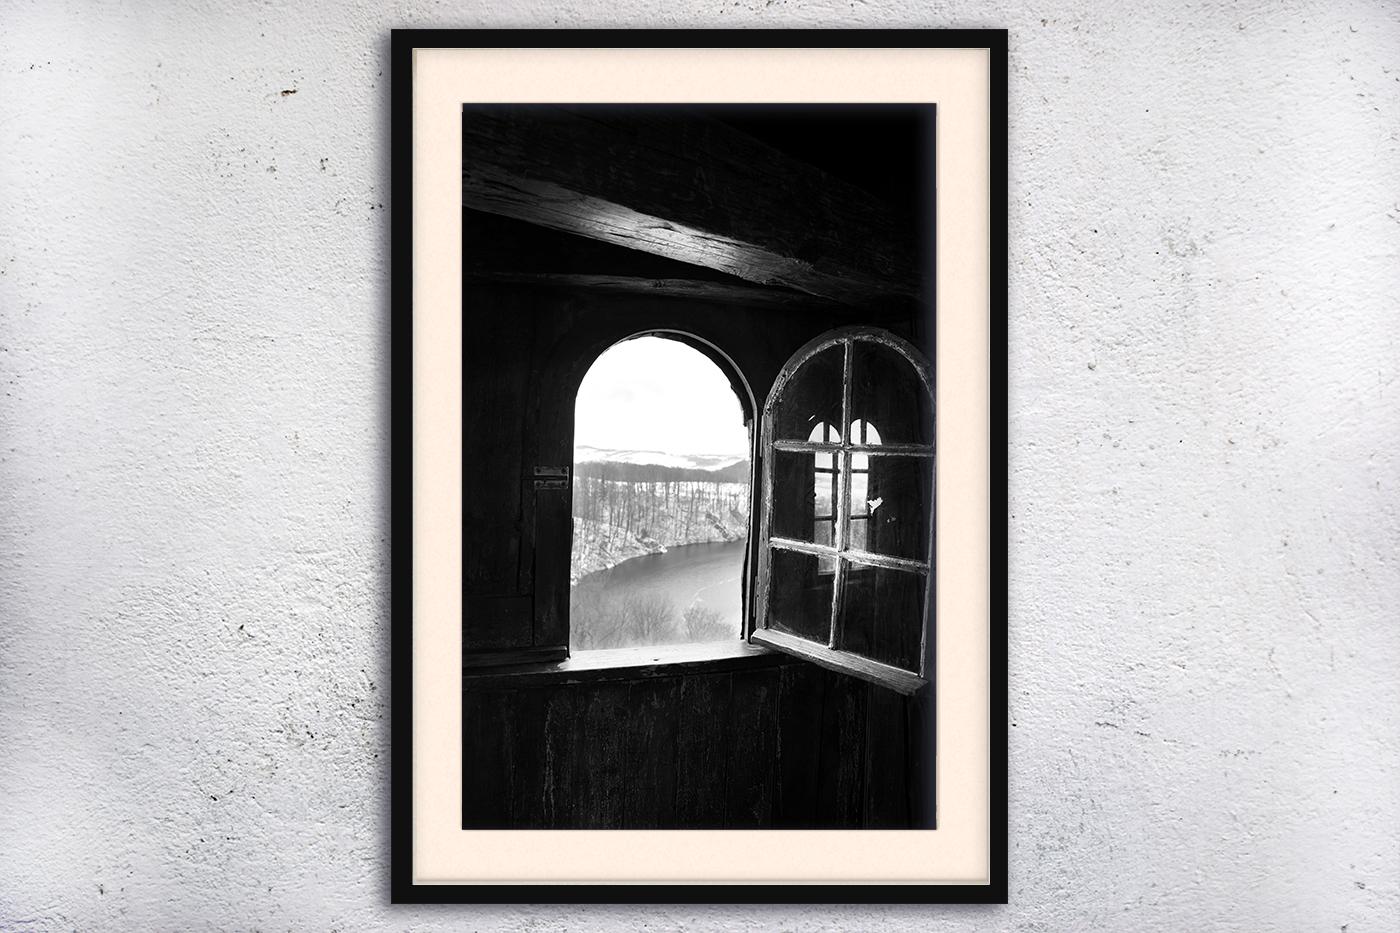 Window photo, architecture photo example image 3